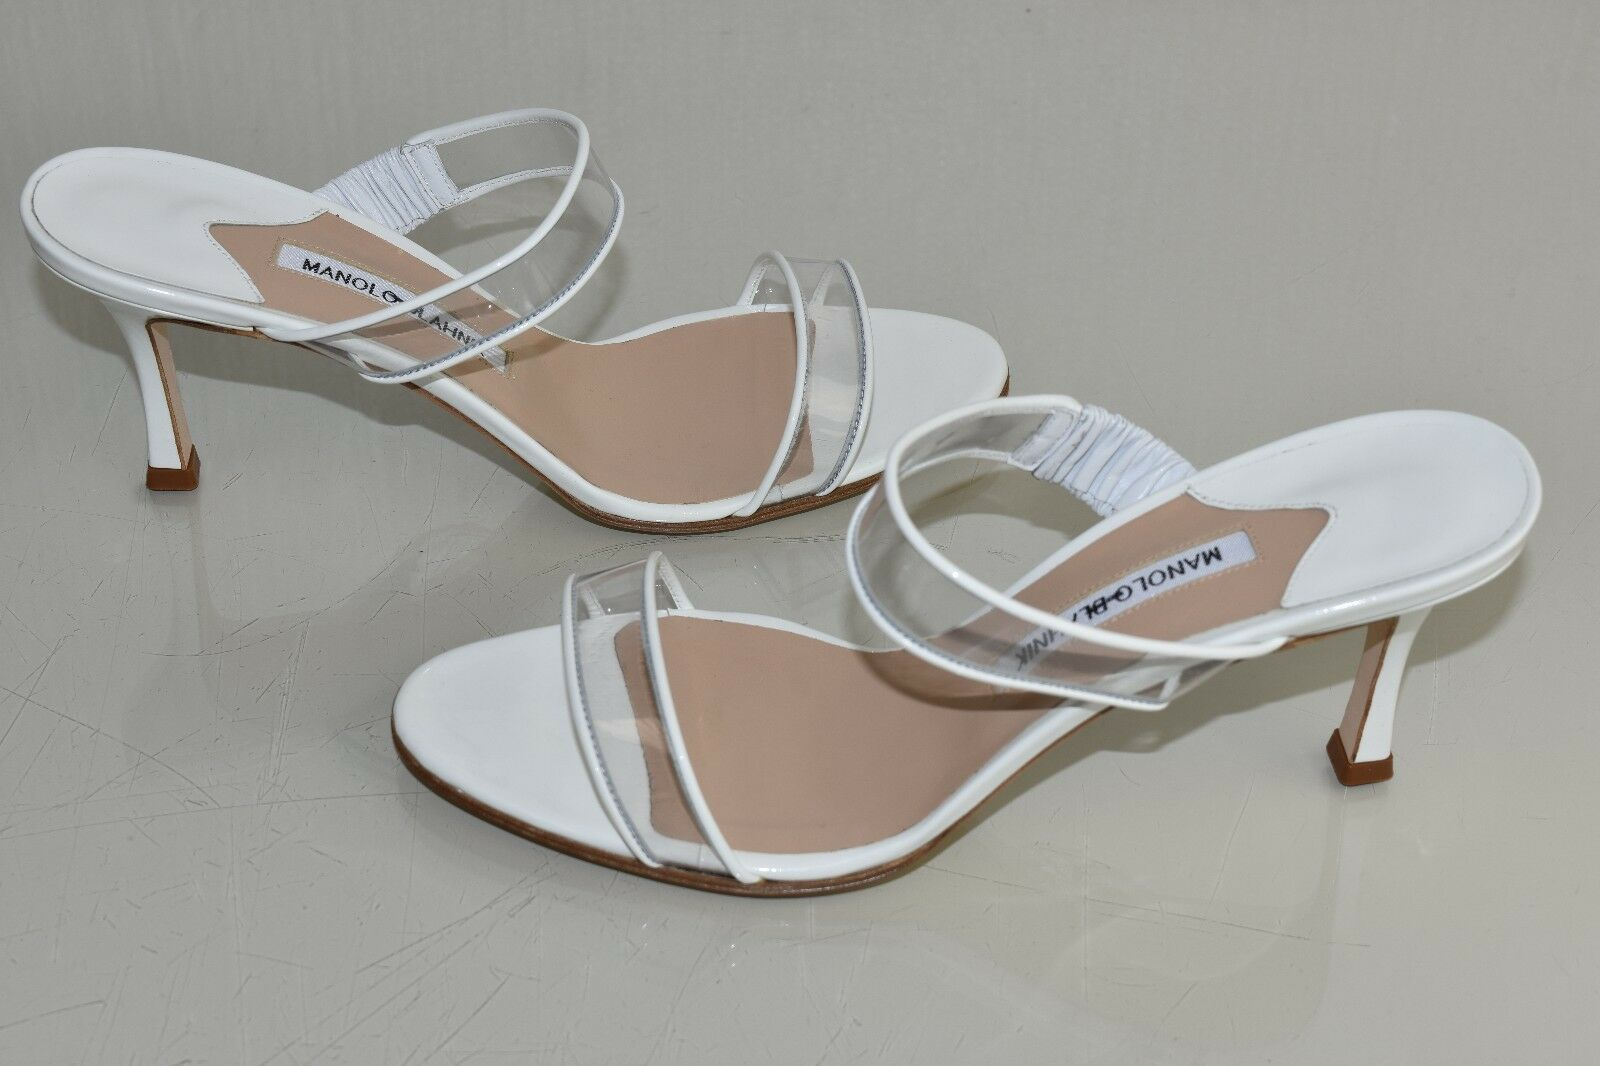 Neu Manolo Blahnik Muluca PVC Sandalen Patent Weiß Slip Absatz Schuhe 40.5